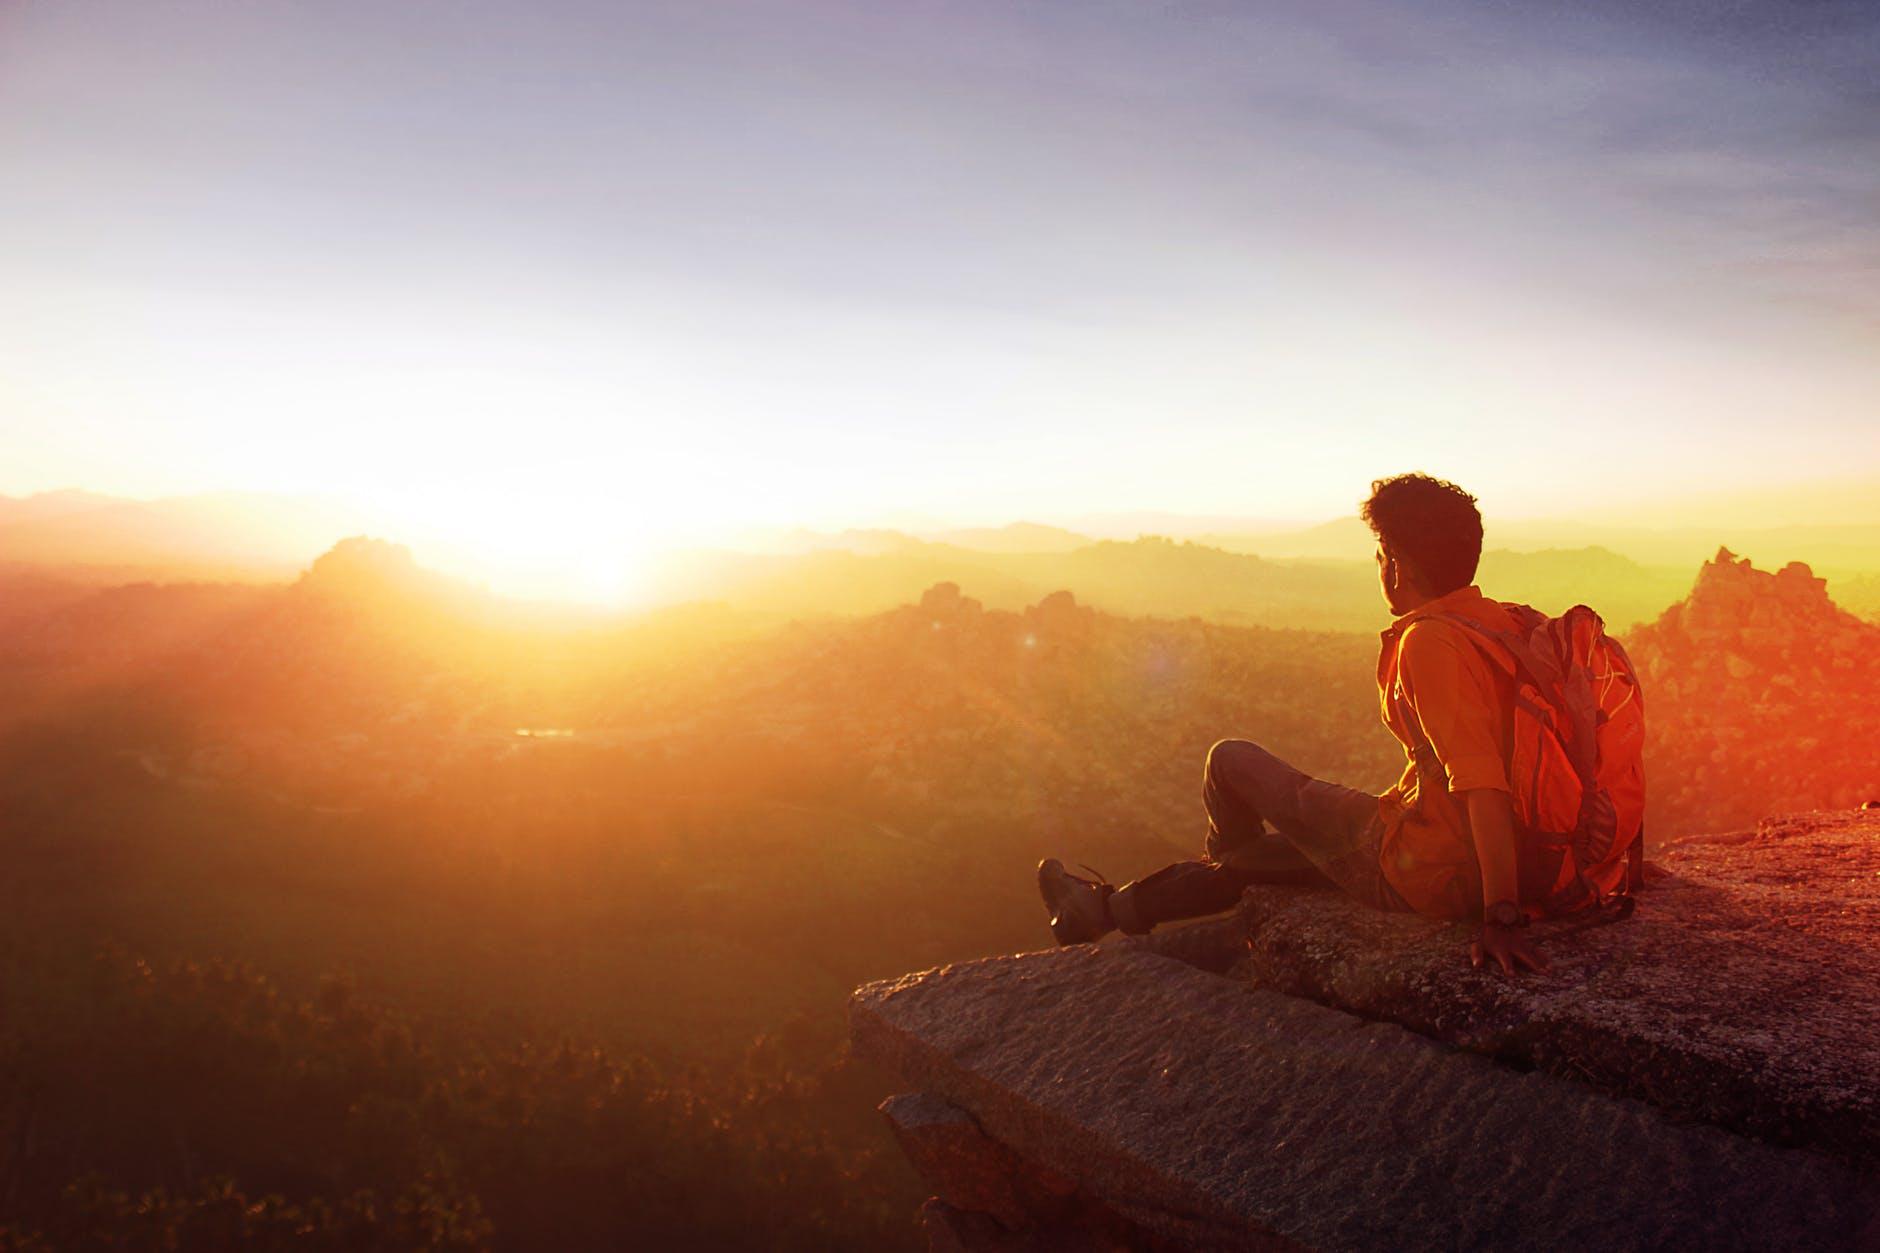 man sitting on edge facing sunset